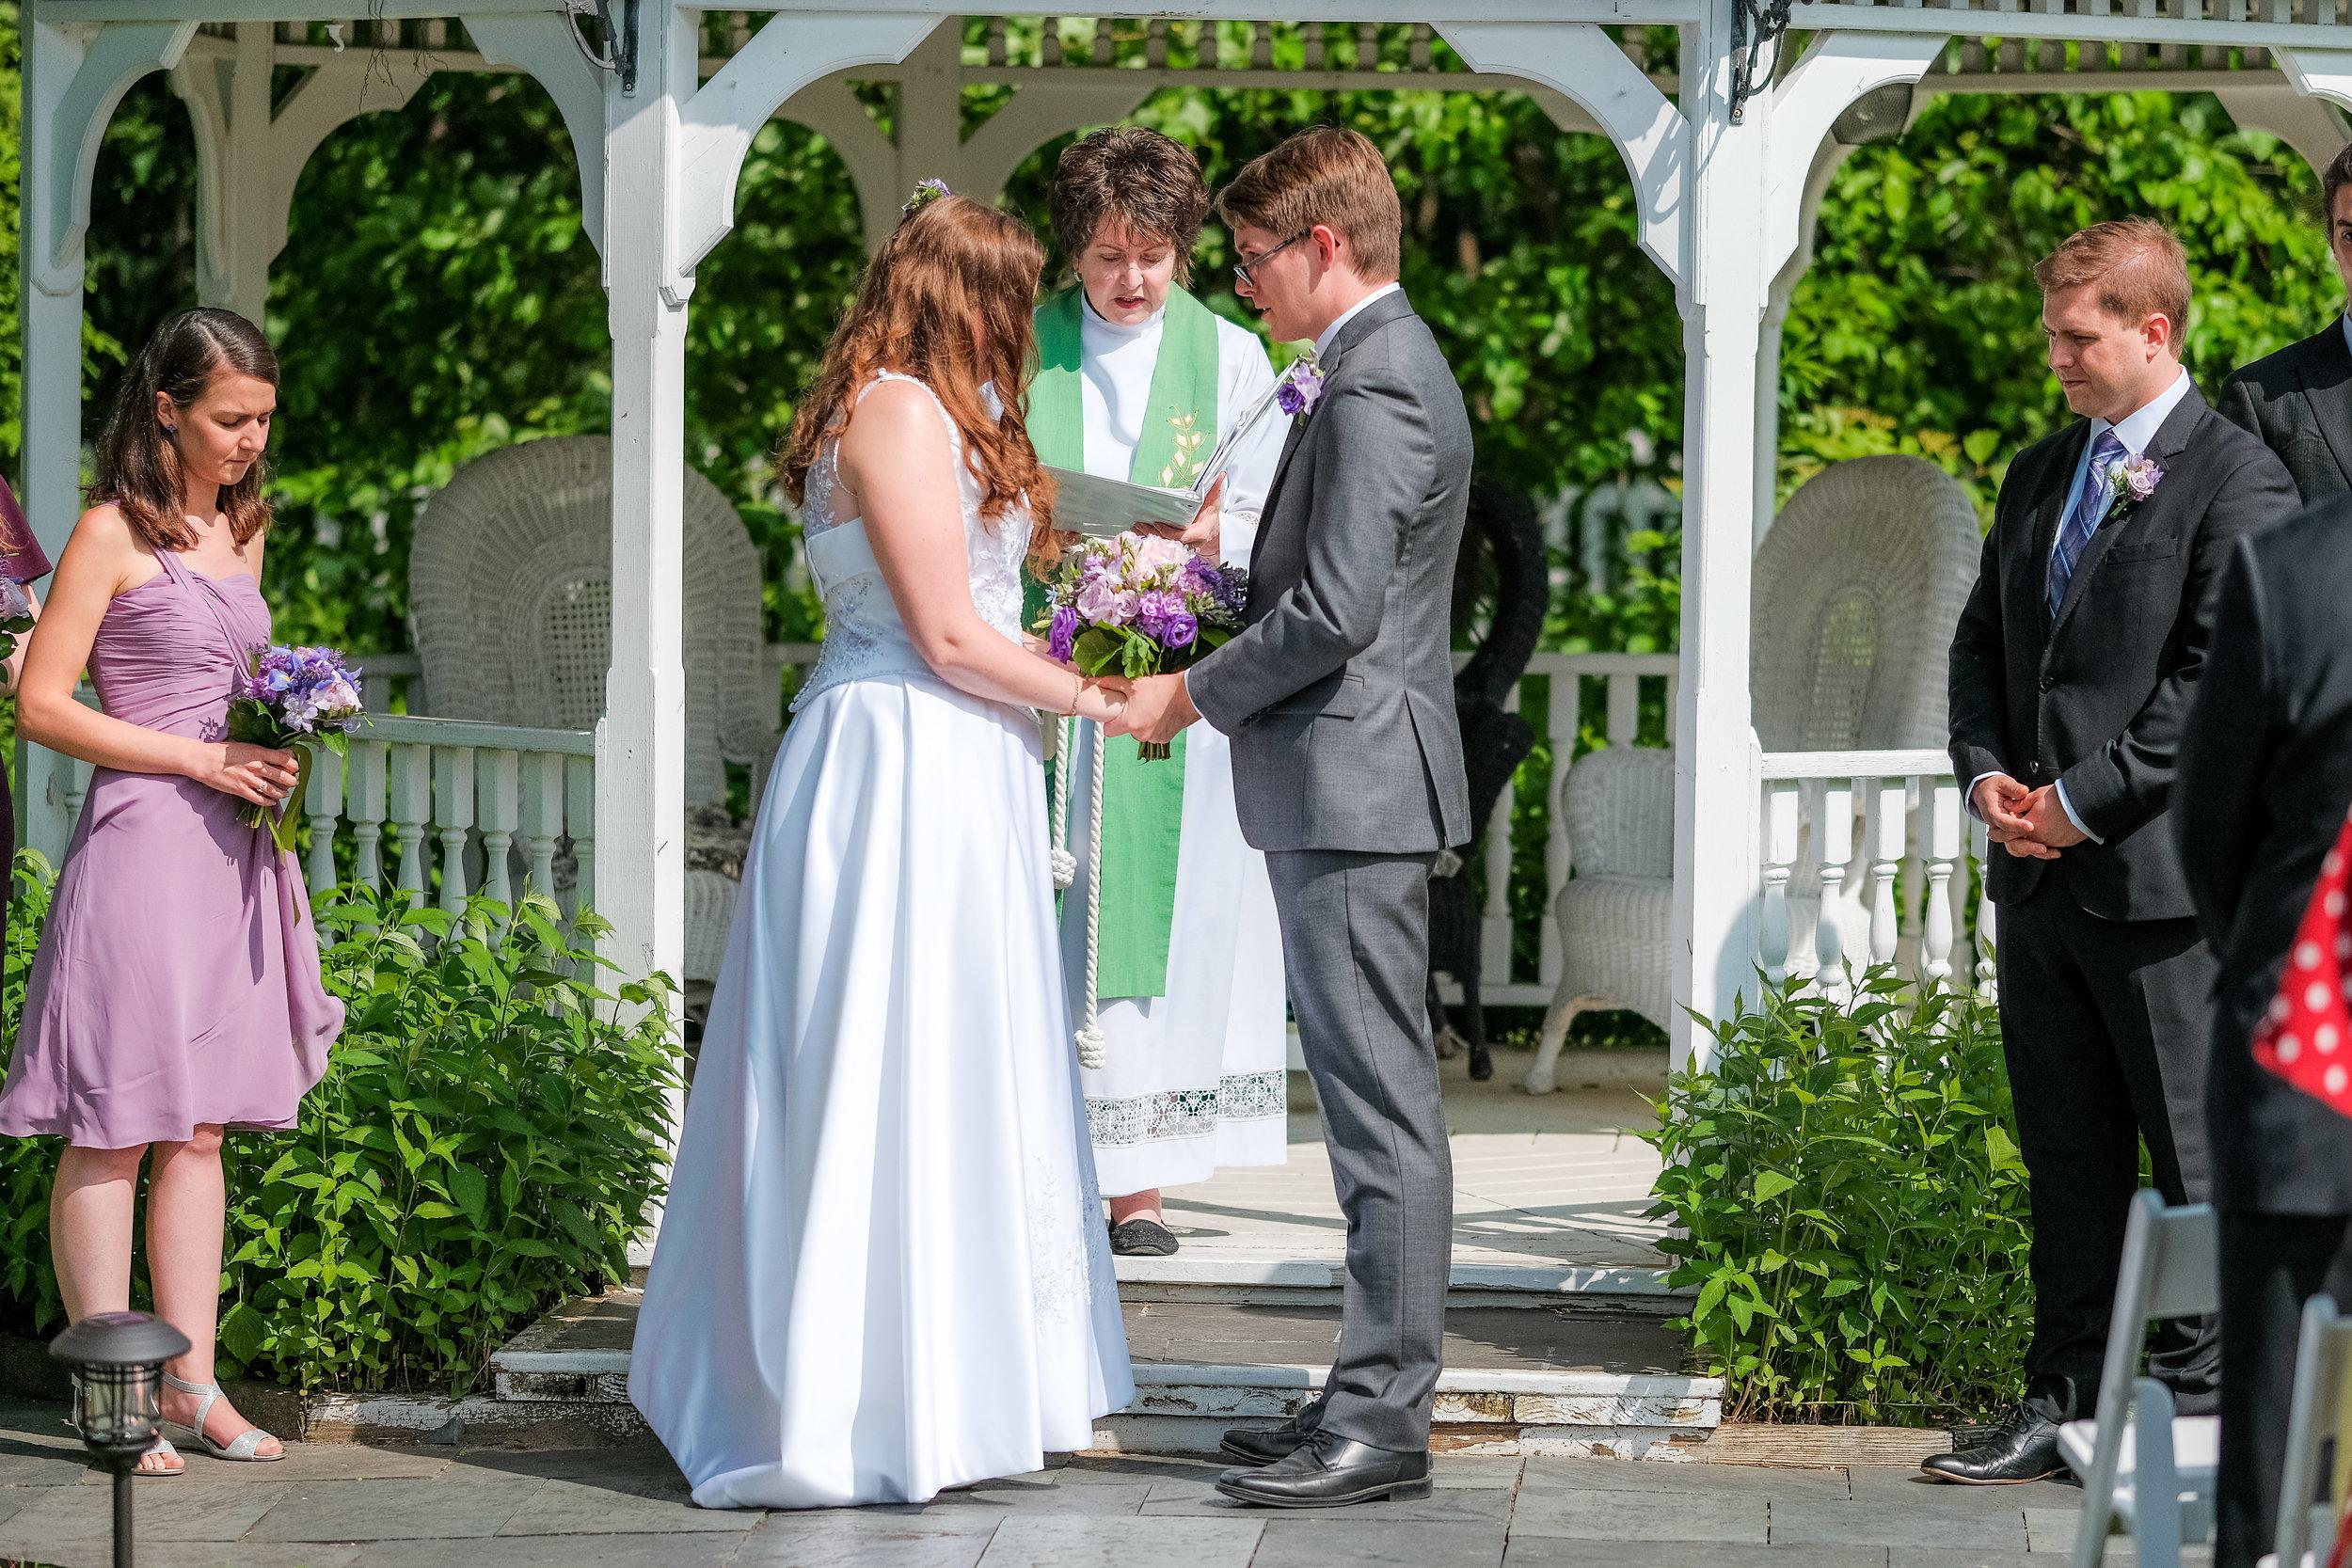 Vermont-Lilac-Inn-Wedding-Photography-553.jpg